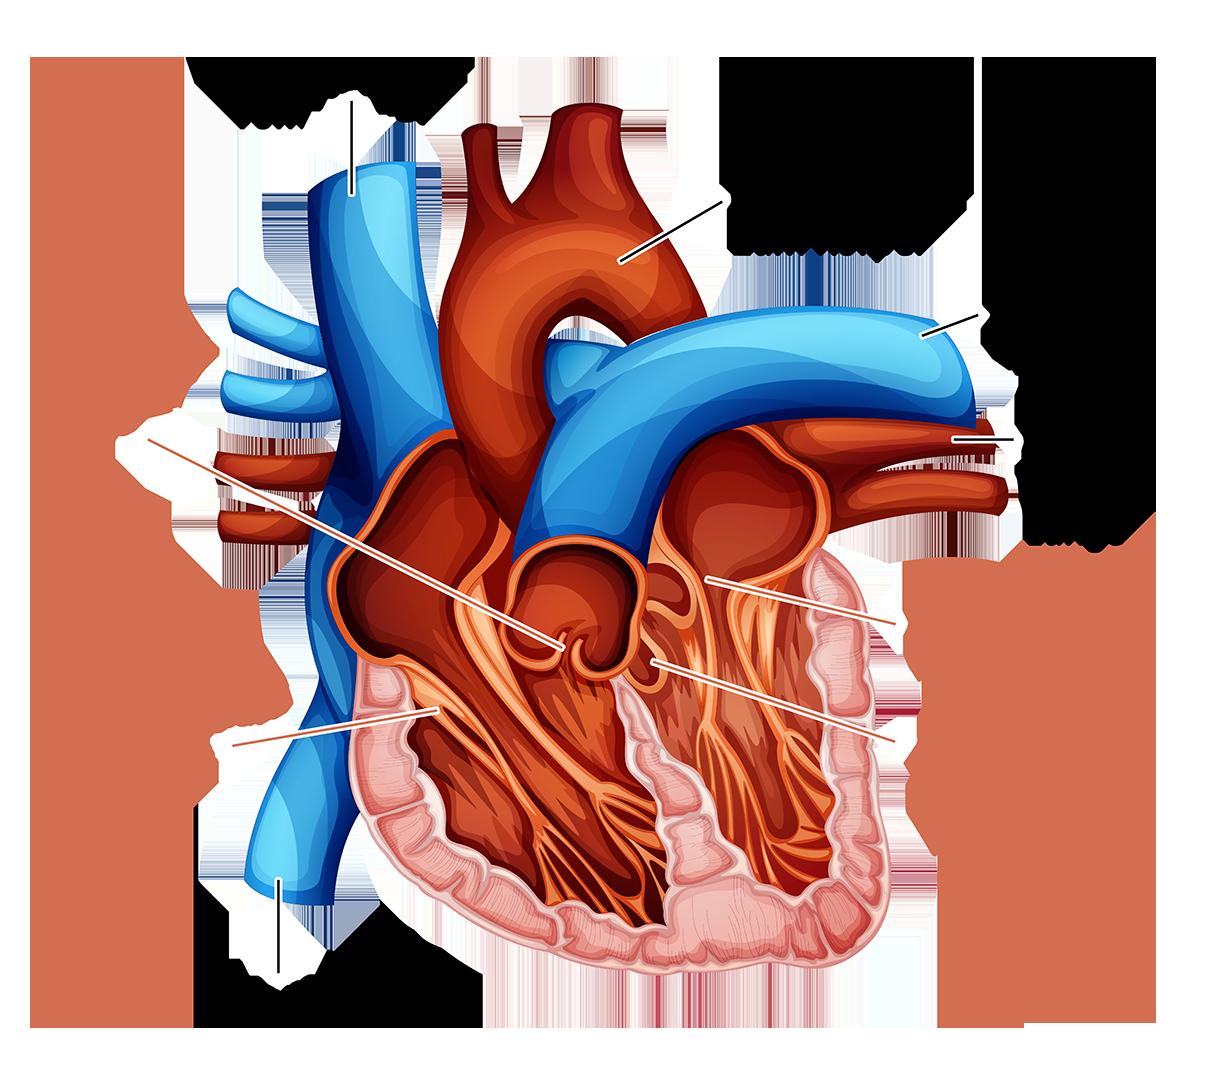 Niederdrucksystem Herz-Kreislauf-System